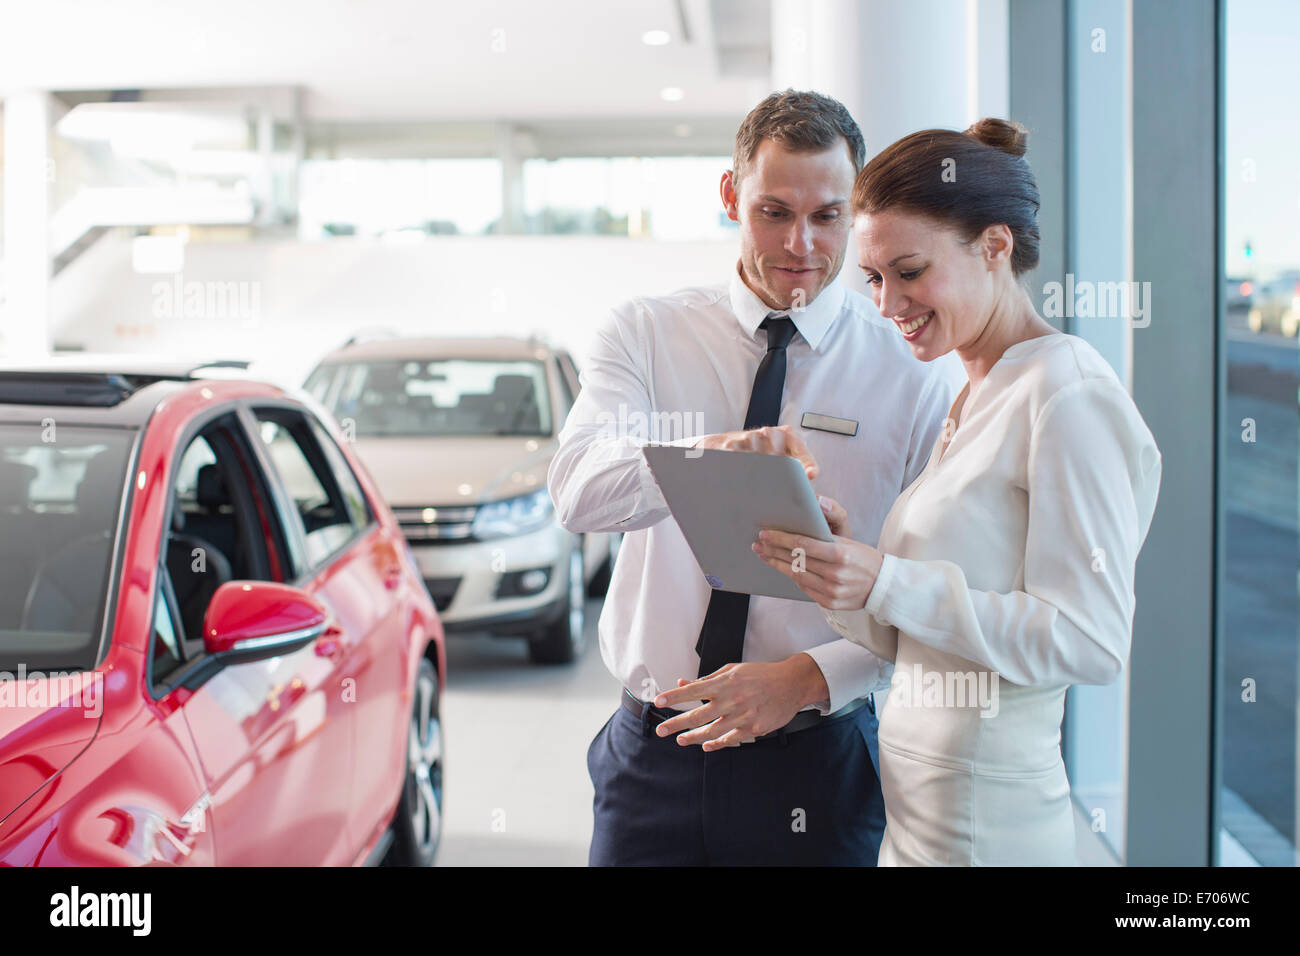 Vendeur et female customer using digital tablet in car dealership Photo Stock